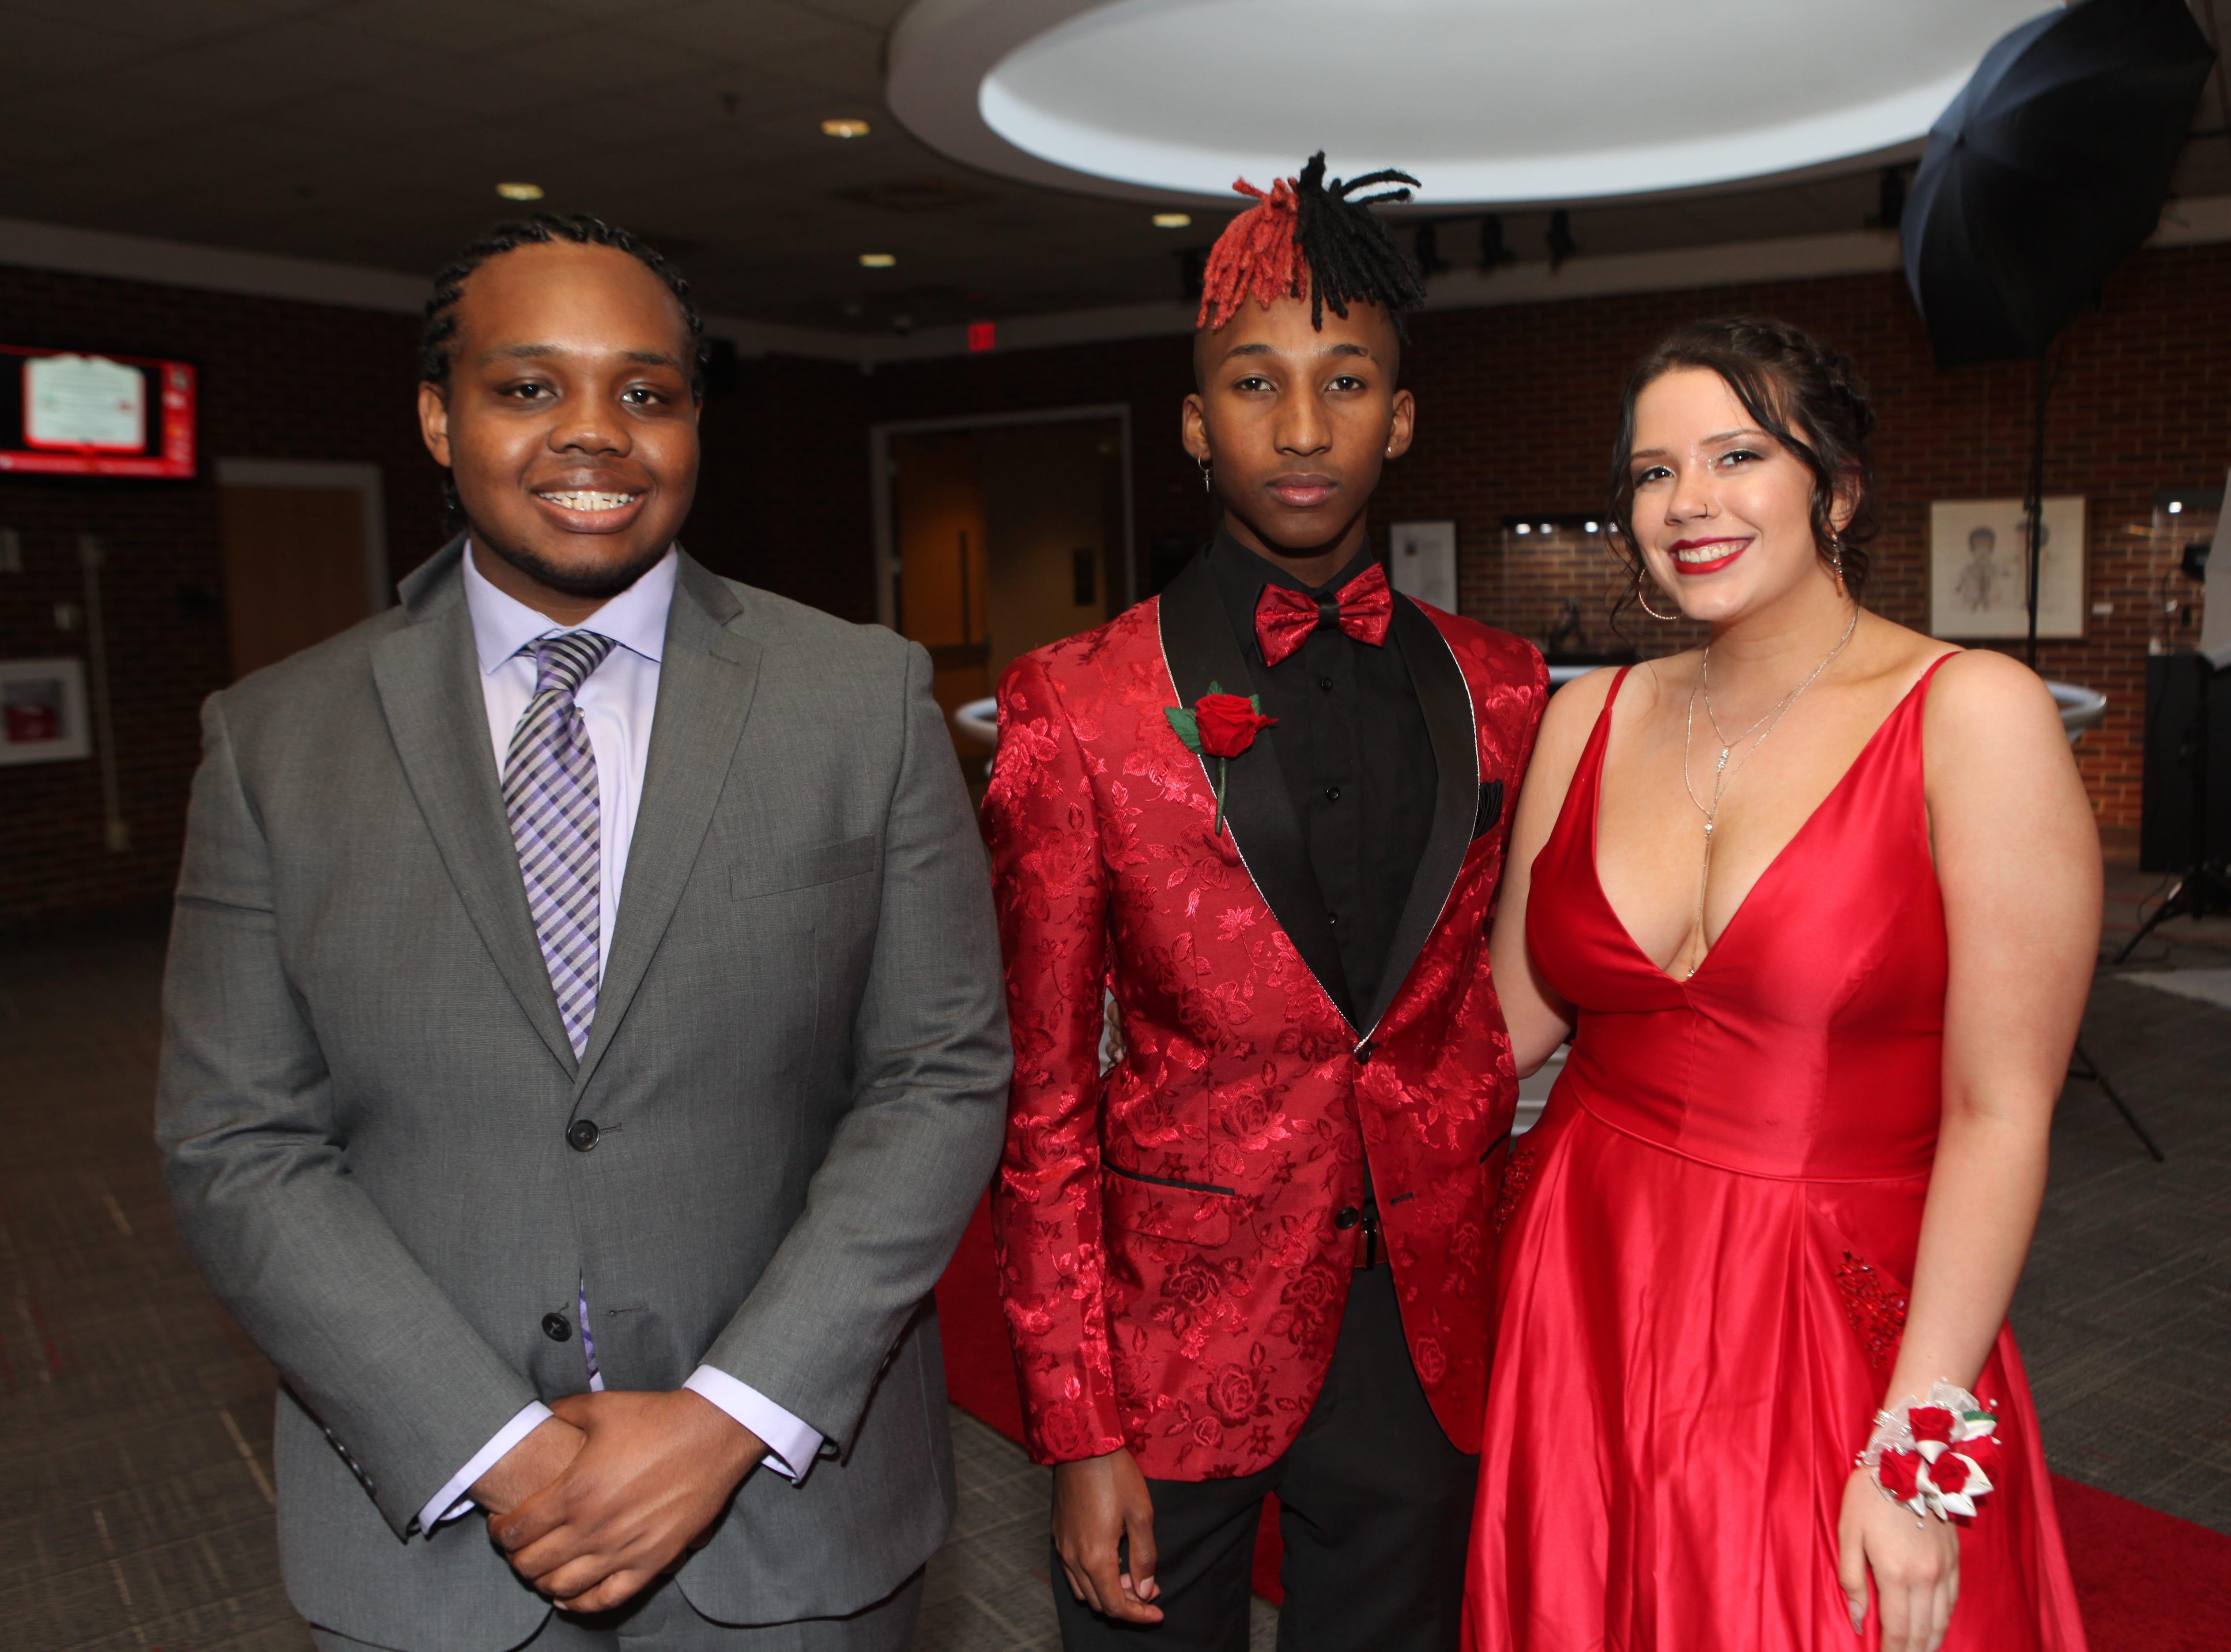 Richard Addison Yamoni Jones and Tatum Wilson at the Middle College 2019 prom at the APSU Ballroom on Friday, April 26, 2019.